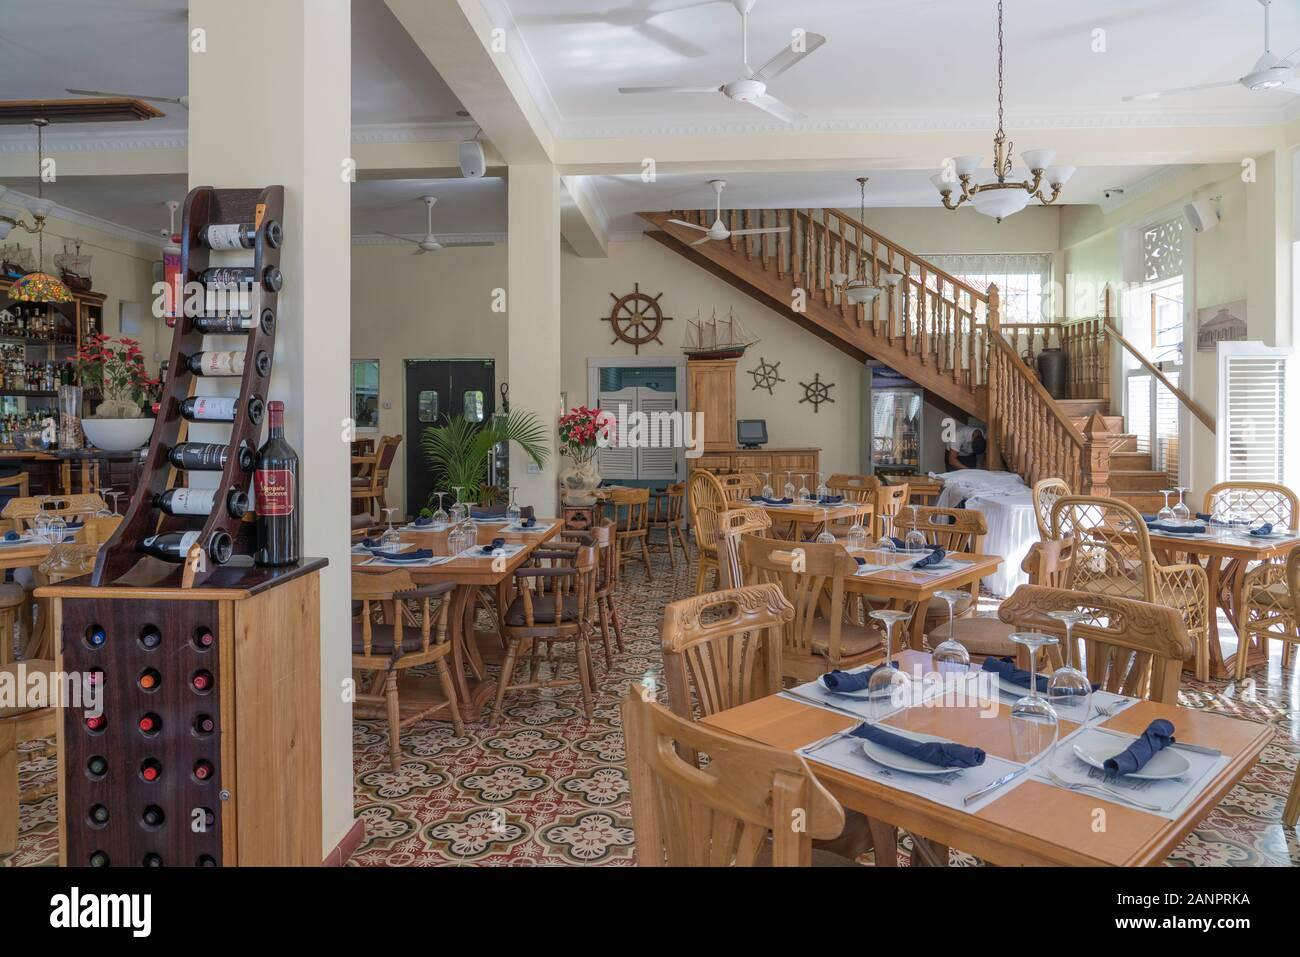 A Restaurant Interior In Downtown Puerto Plata Dominican Republic Caribbean Stock Photo Alamy